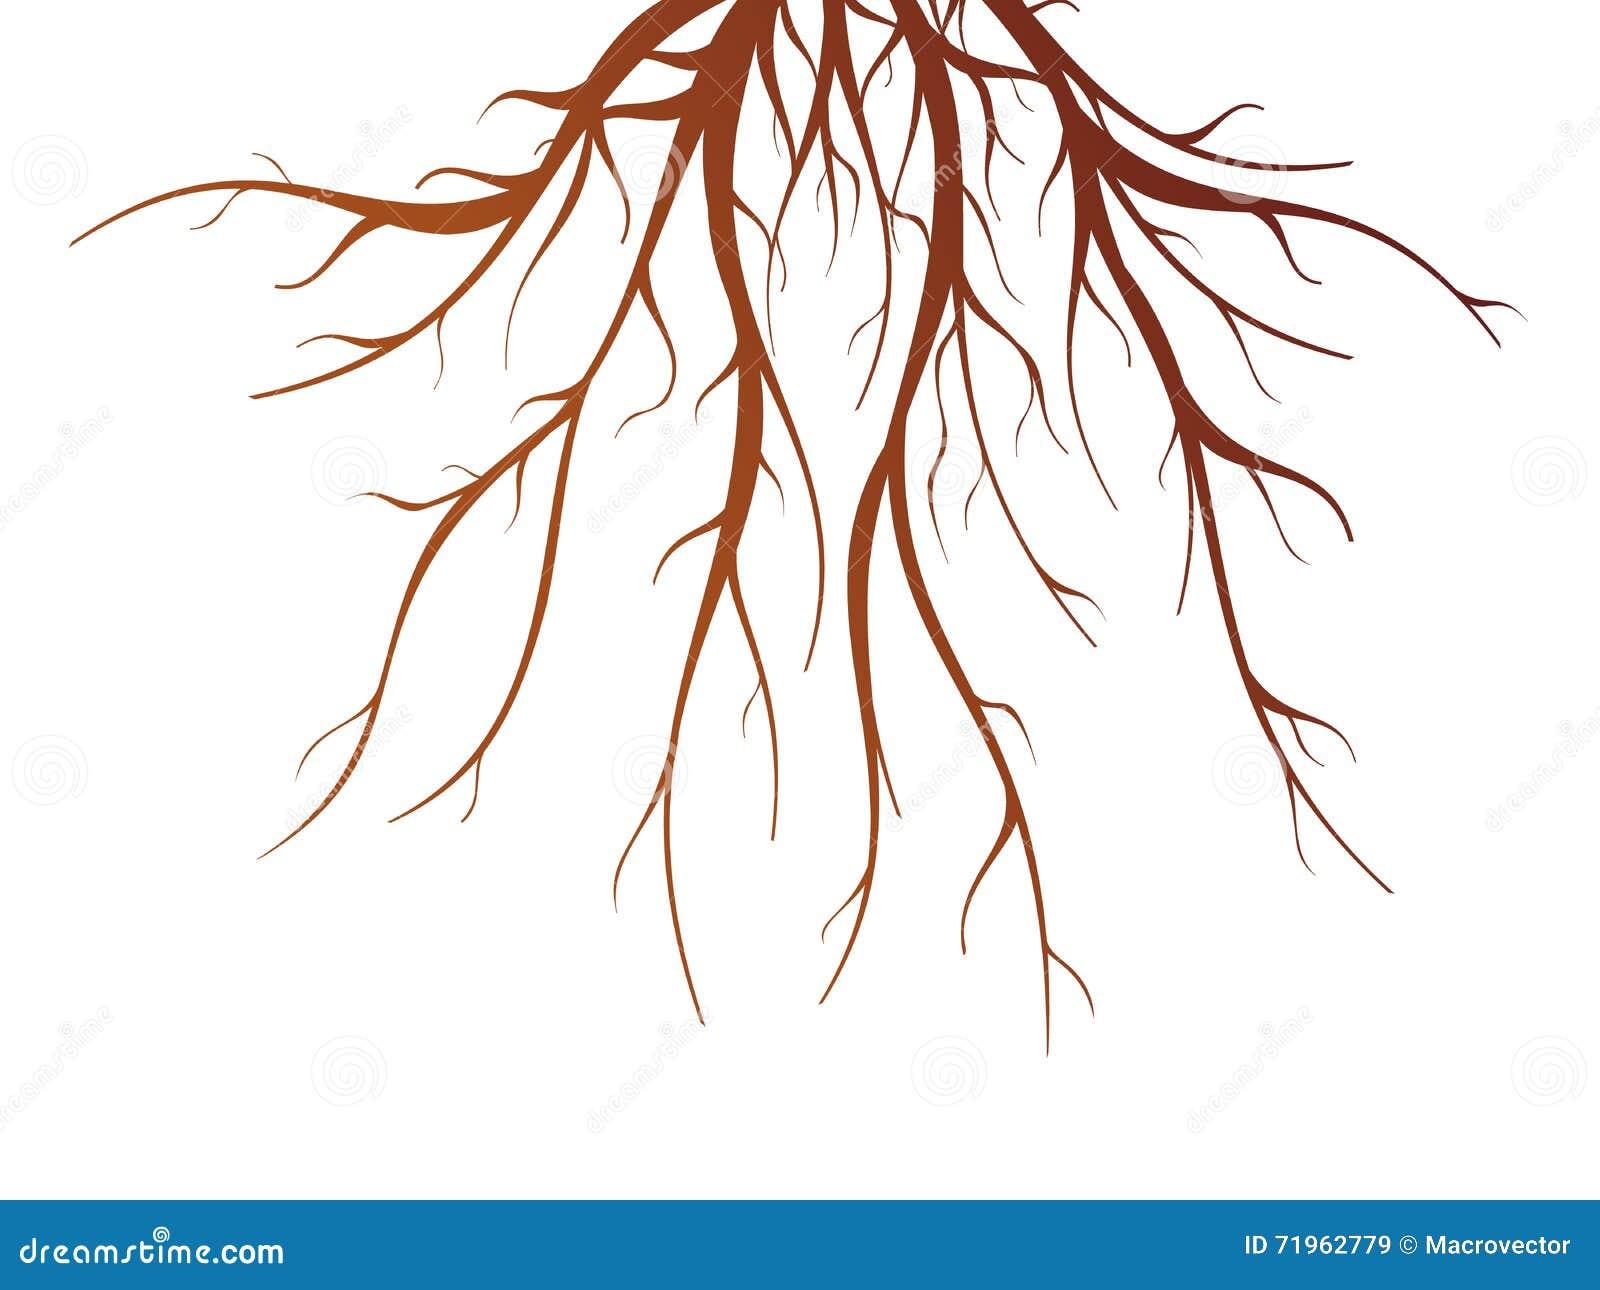 Baum-Wurzel-Illustration Vektor Abbildung - Bild: 71962779